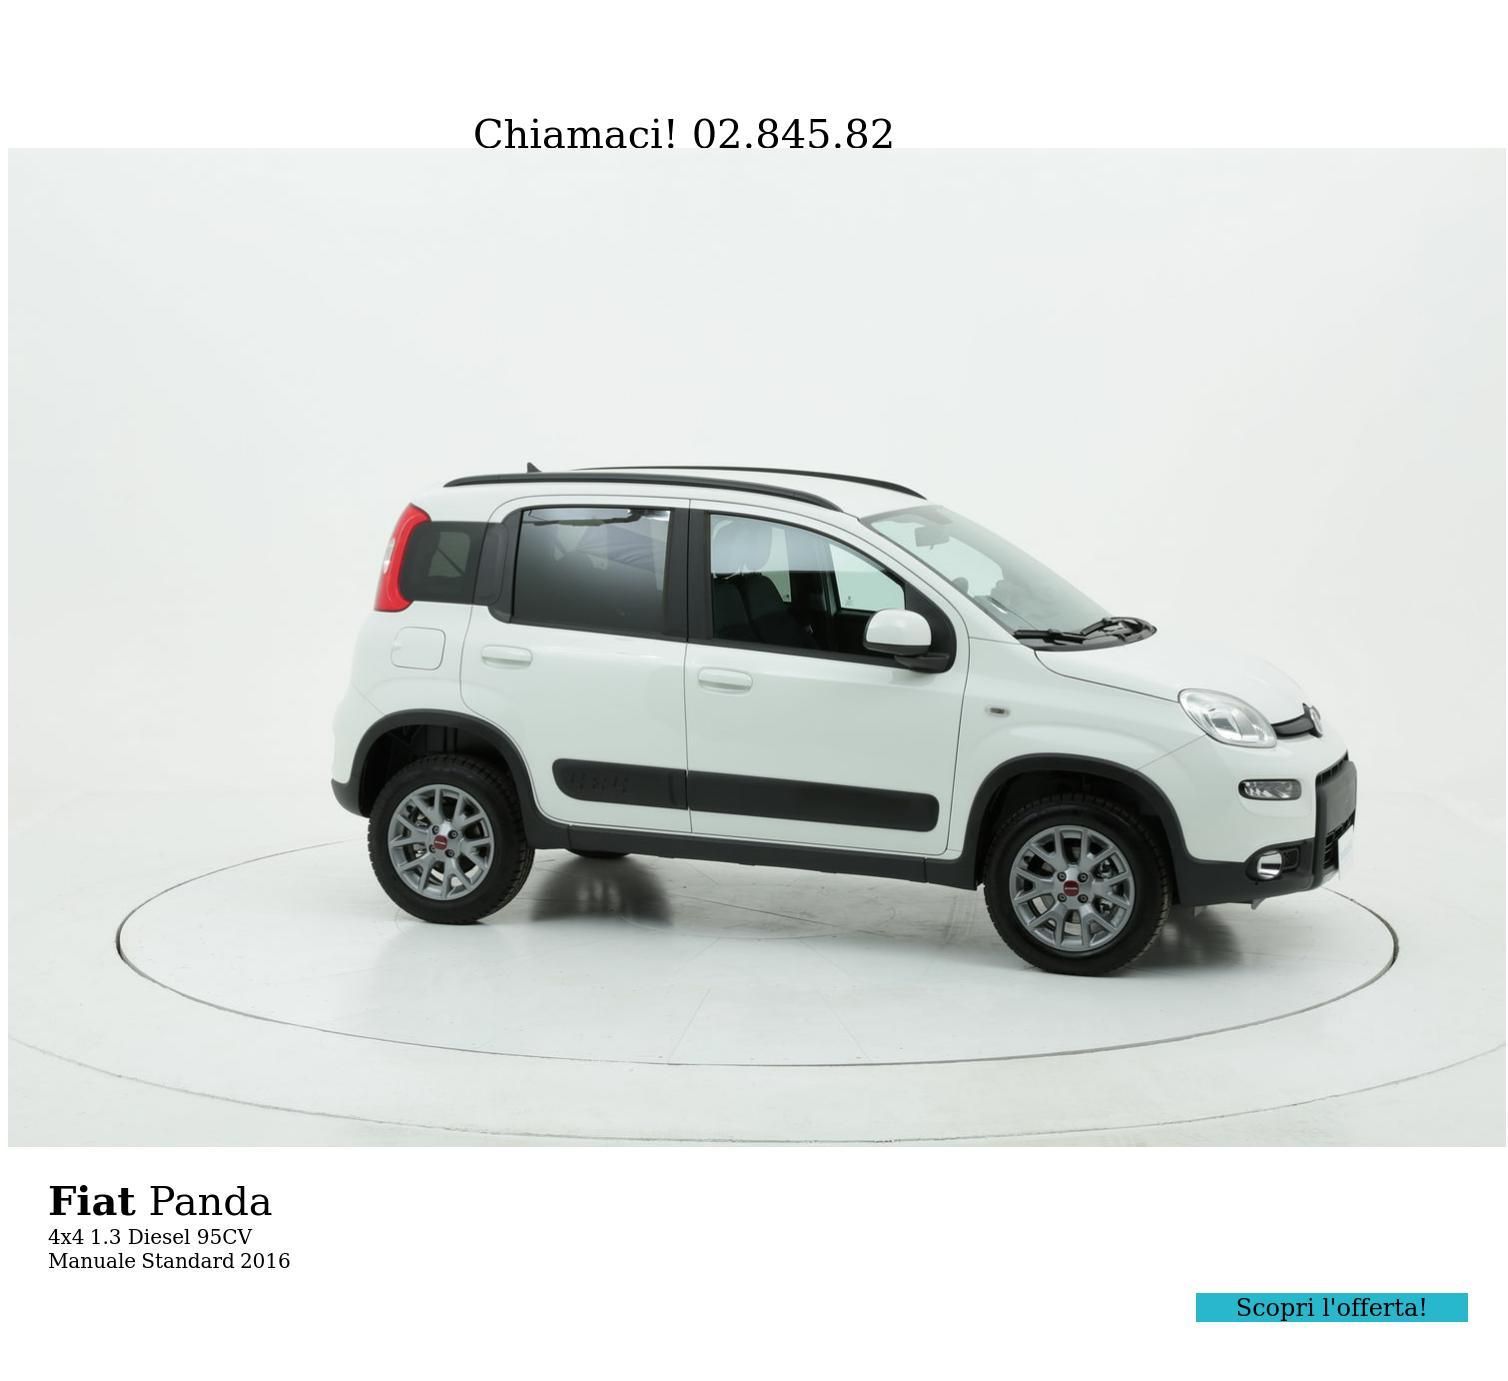 Fiat Panda 4x4 km 0 diesel bianca | brumbrum